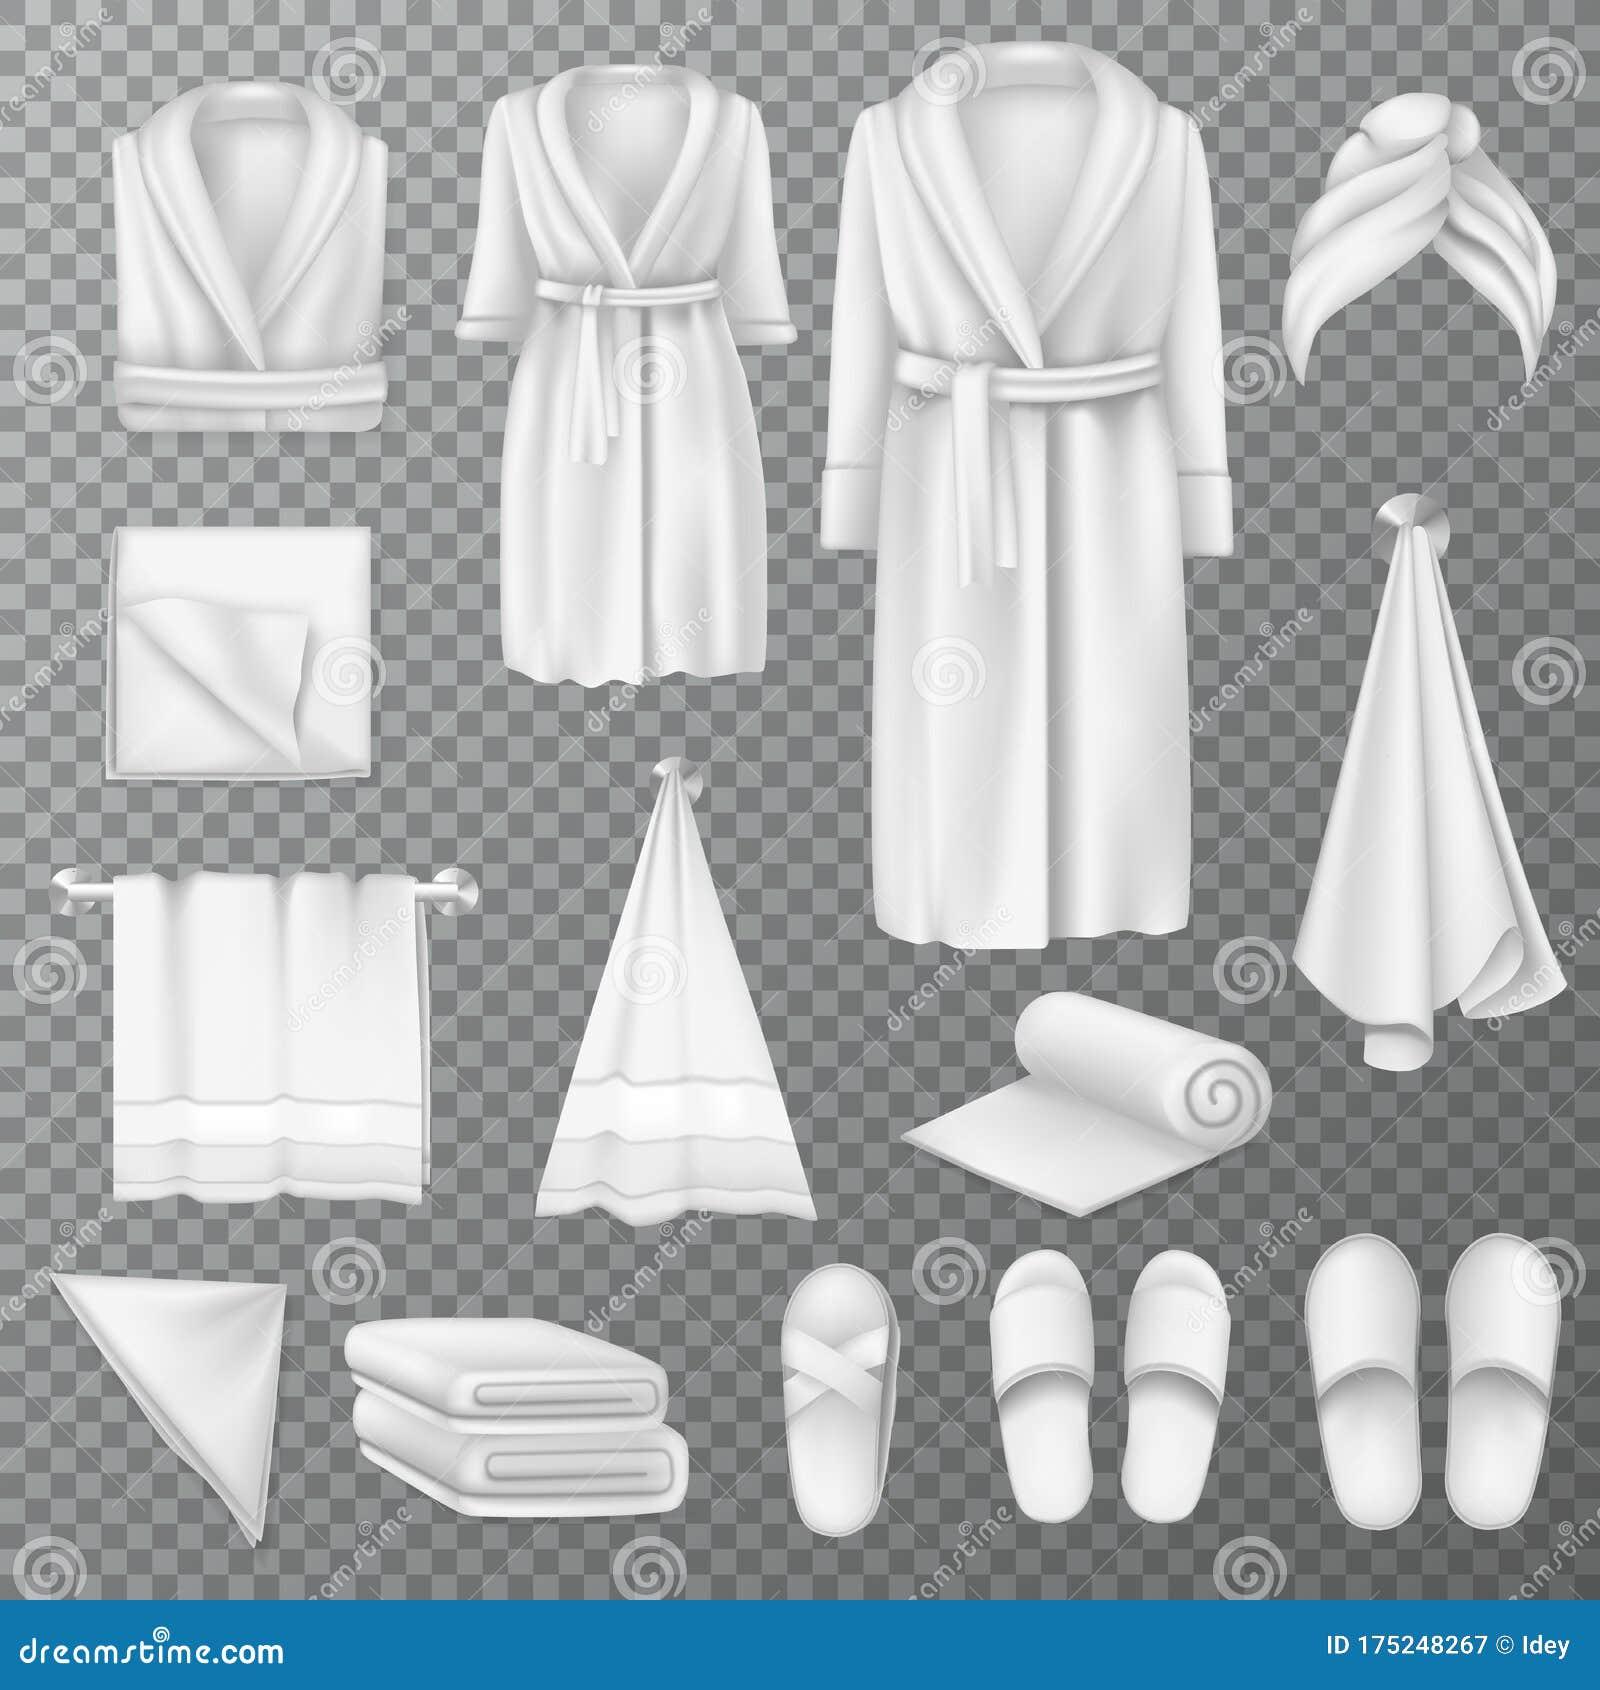 Woman With Bathrobe For Spa Template: Blank Bathrobe Fluffy Towel, Slippers, Cloths Empty